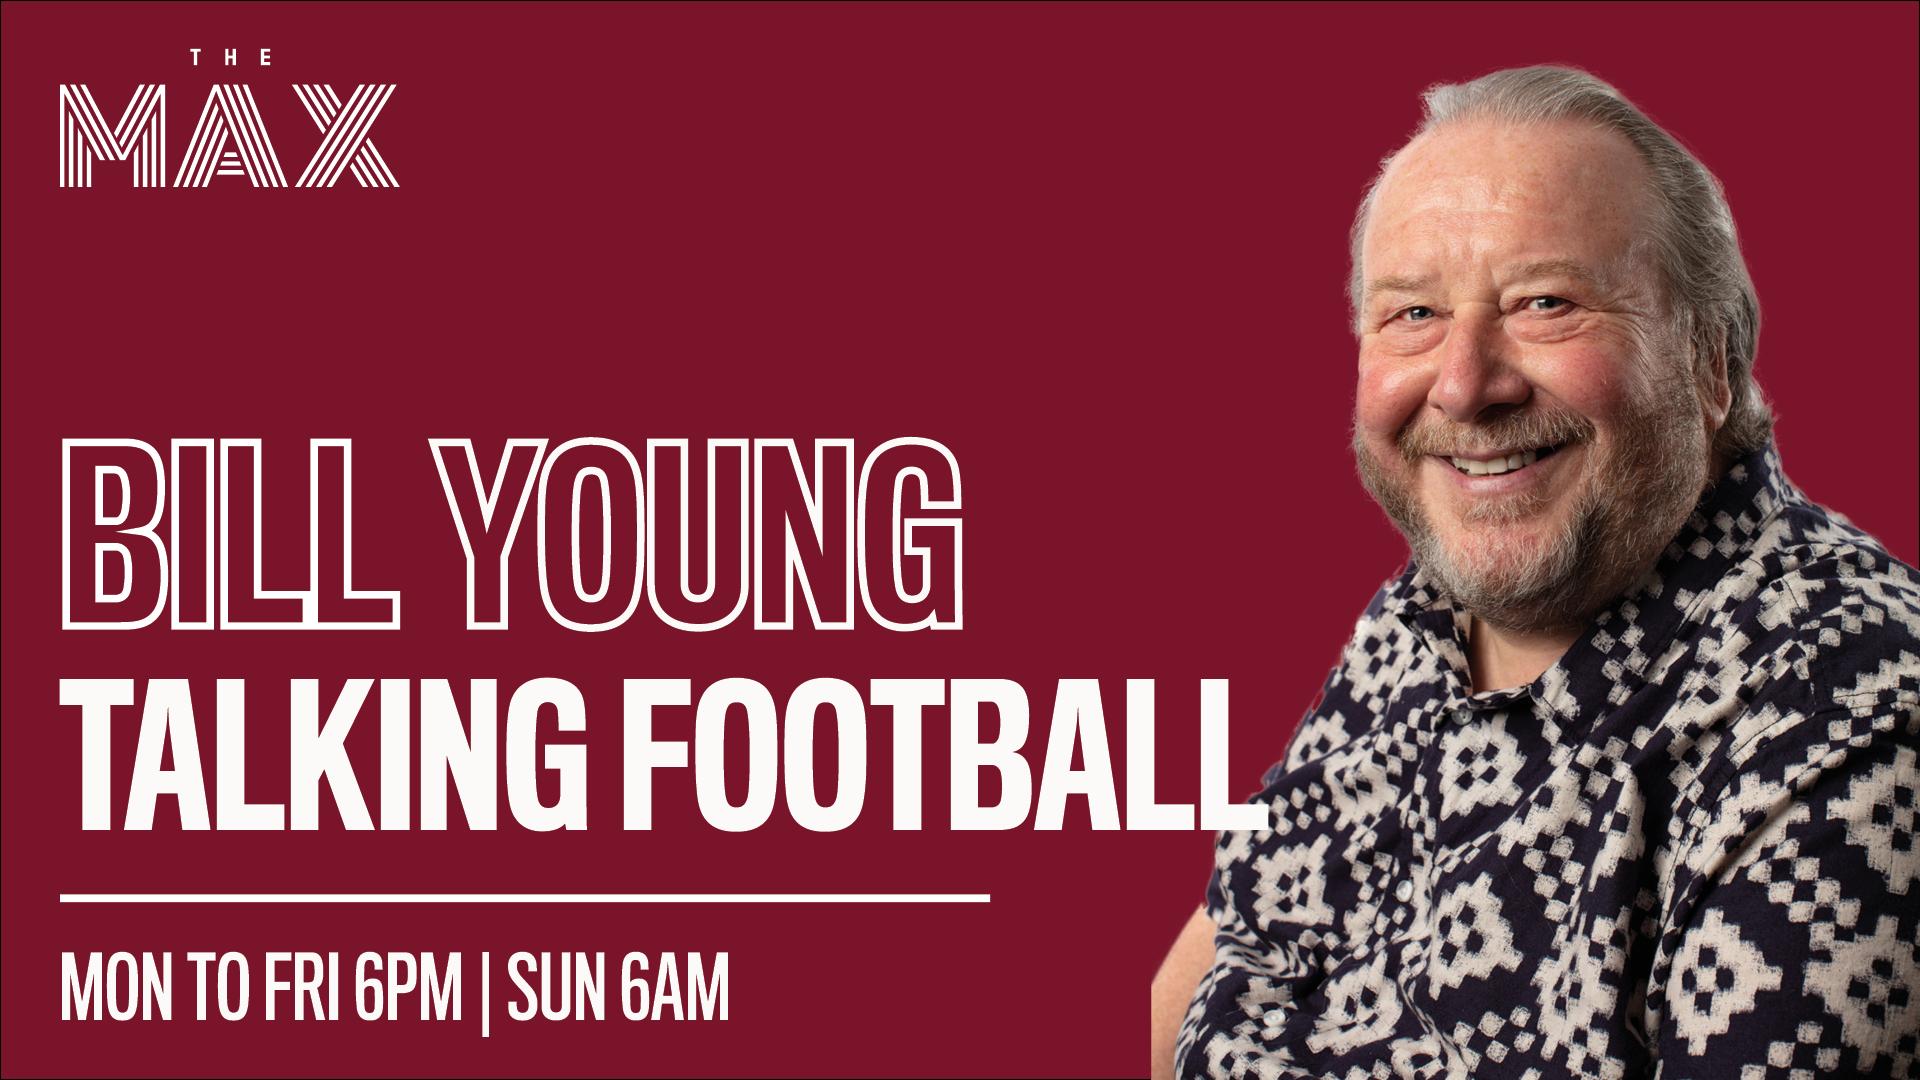 Talking Football with Bill Young - Friday 7th May